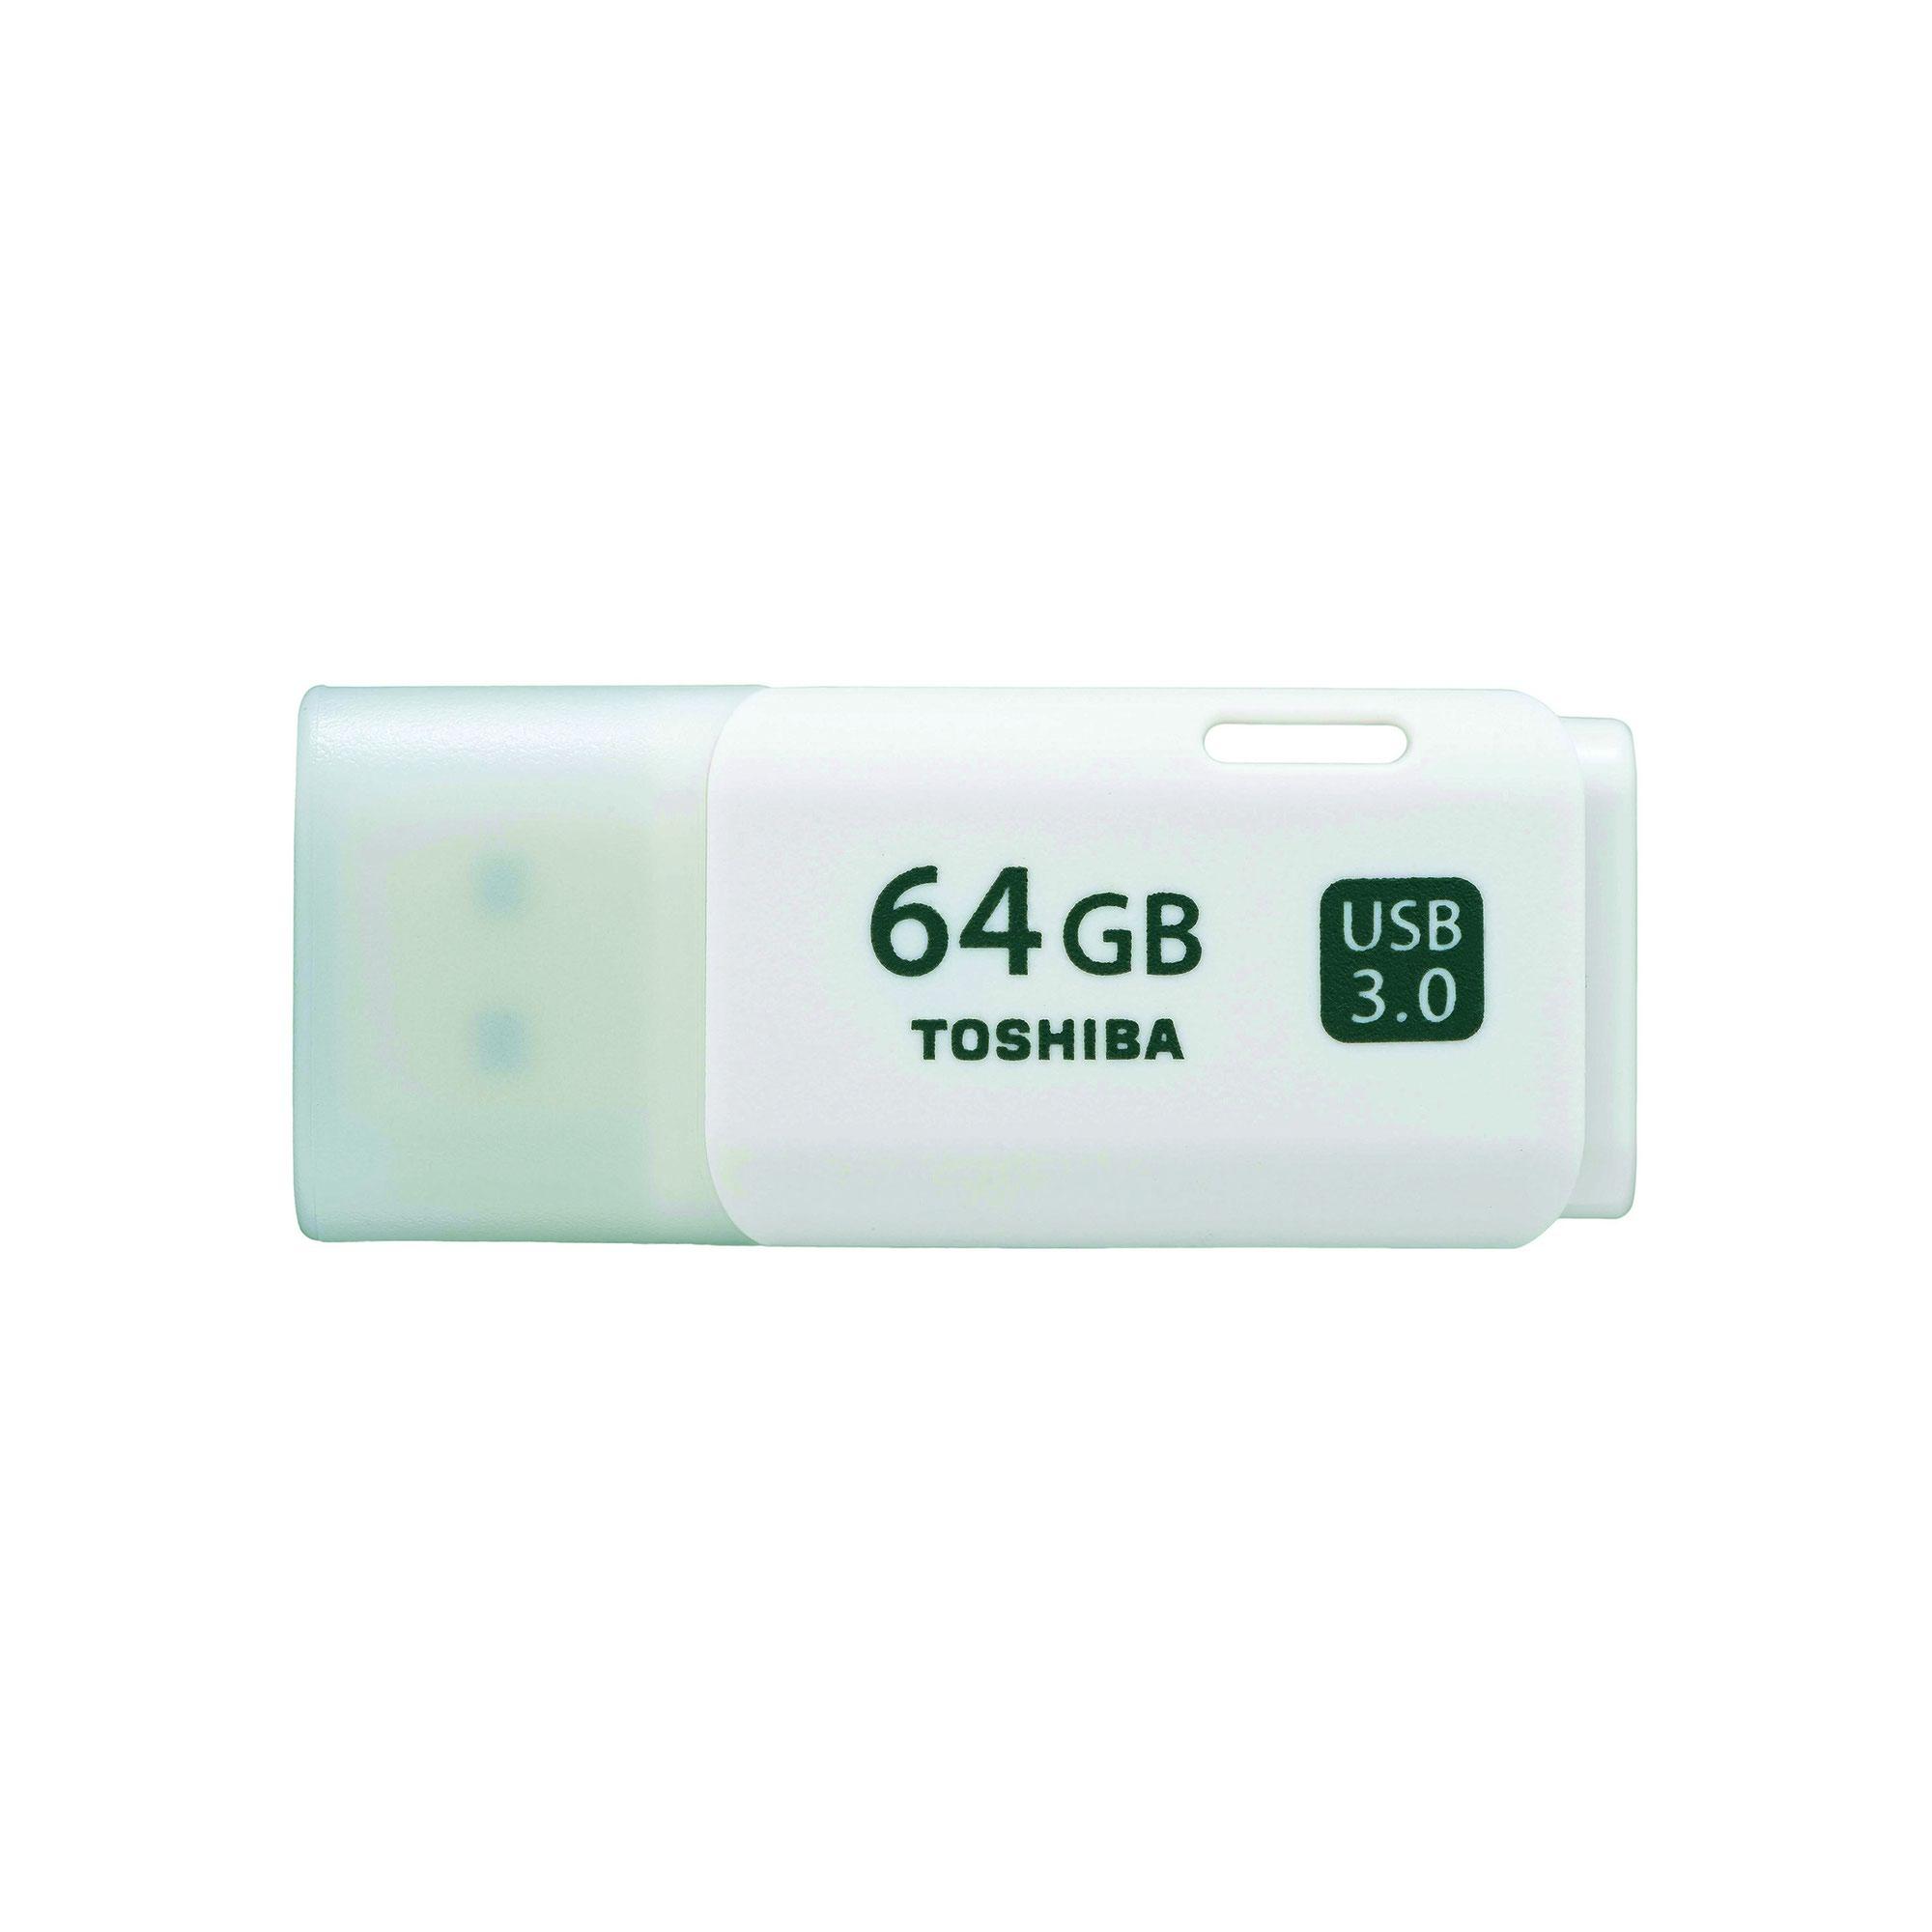 NMM7534